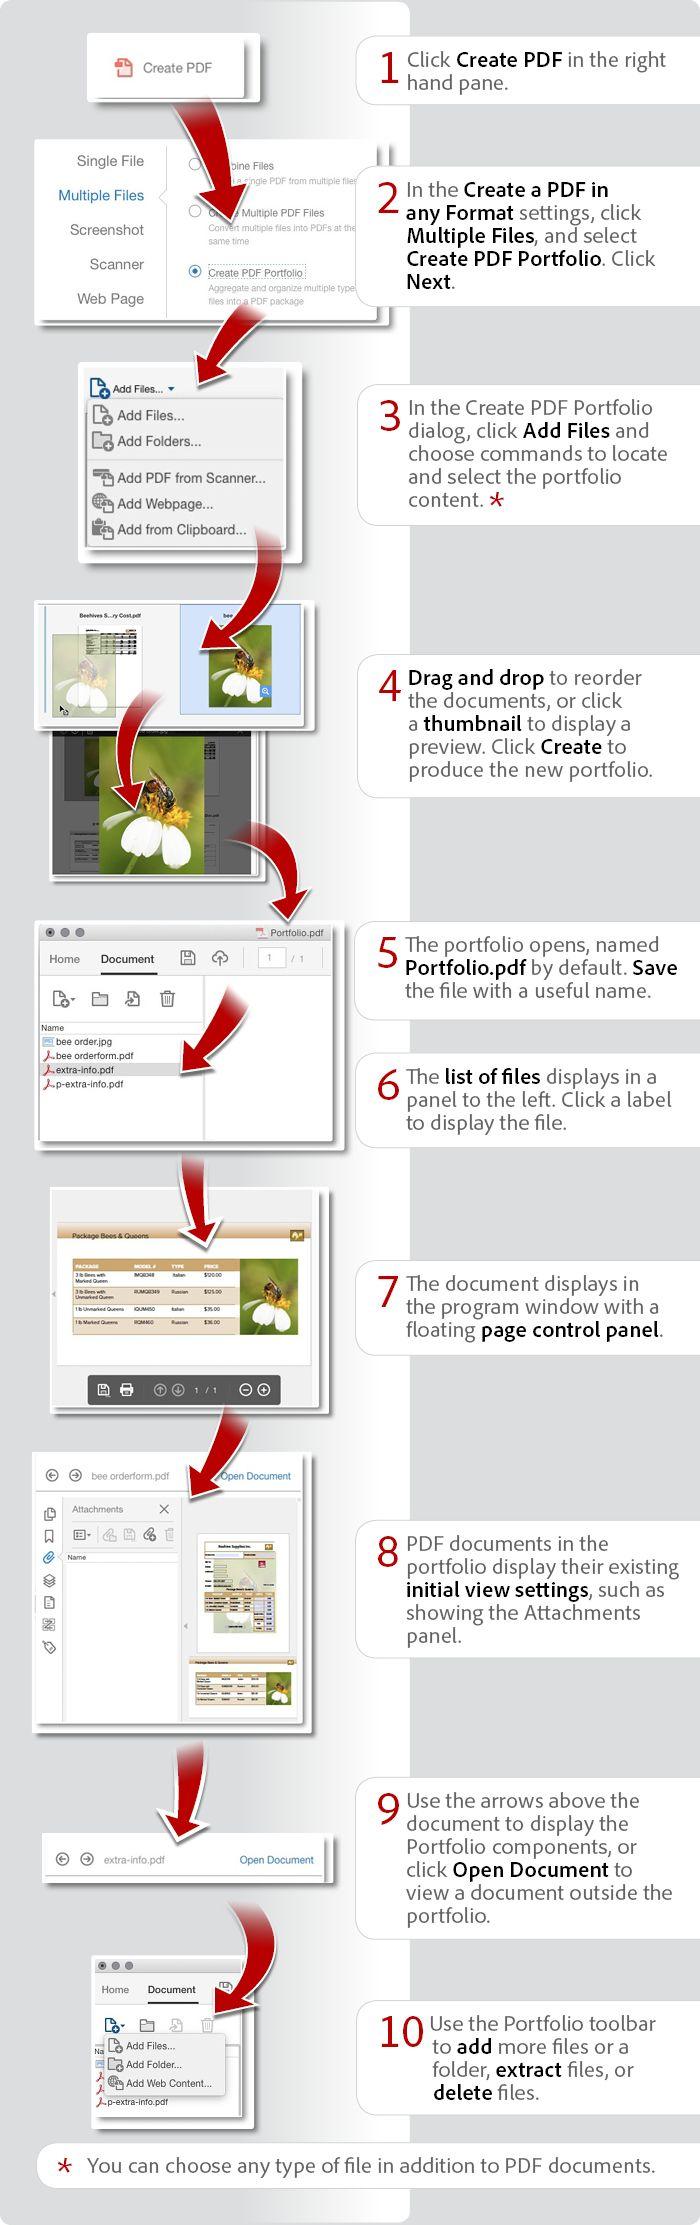 How to combine files to create a PDF Portfolio using Acrobat DC